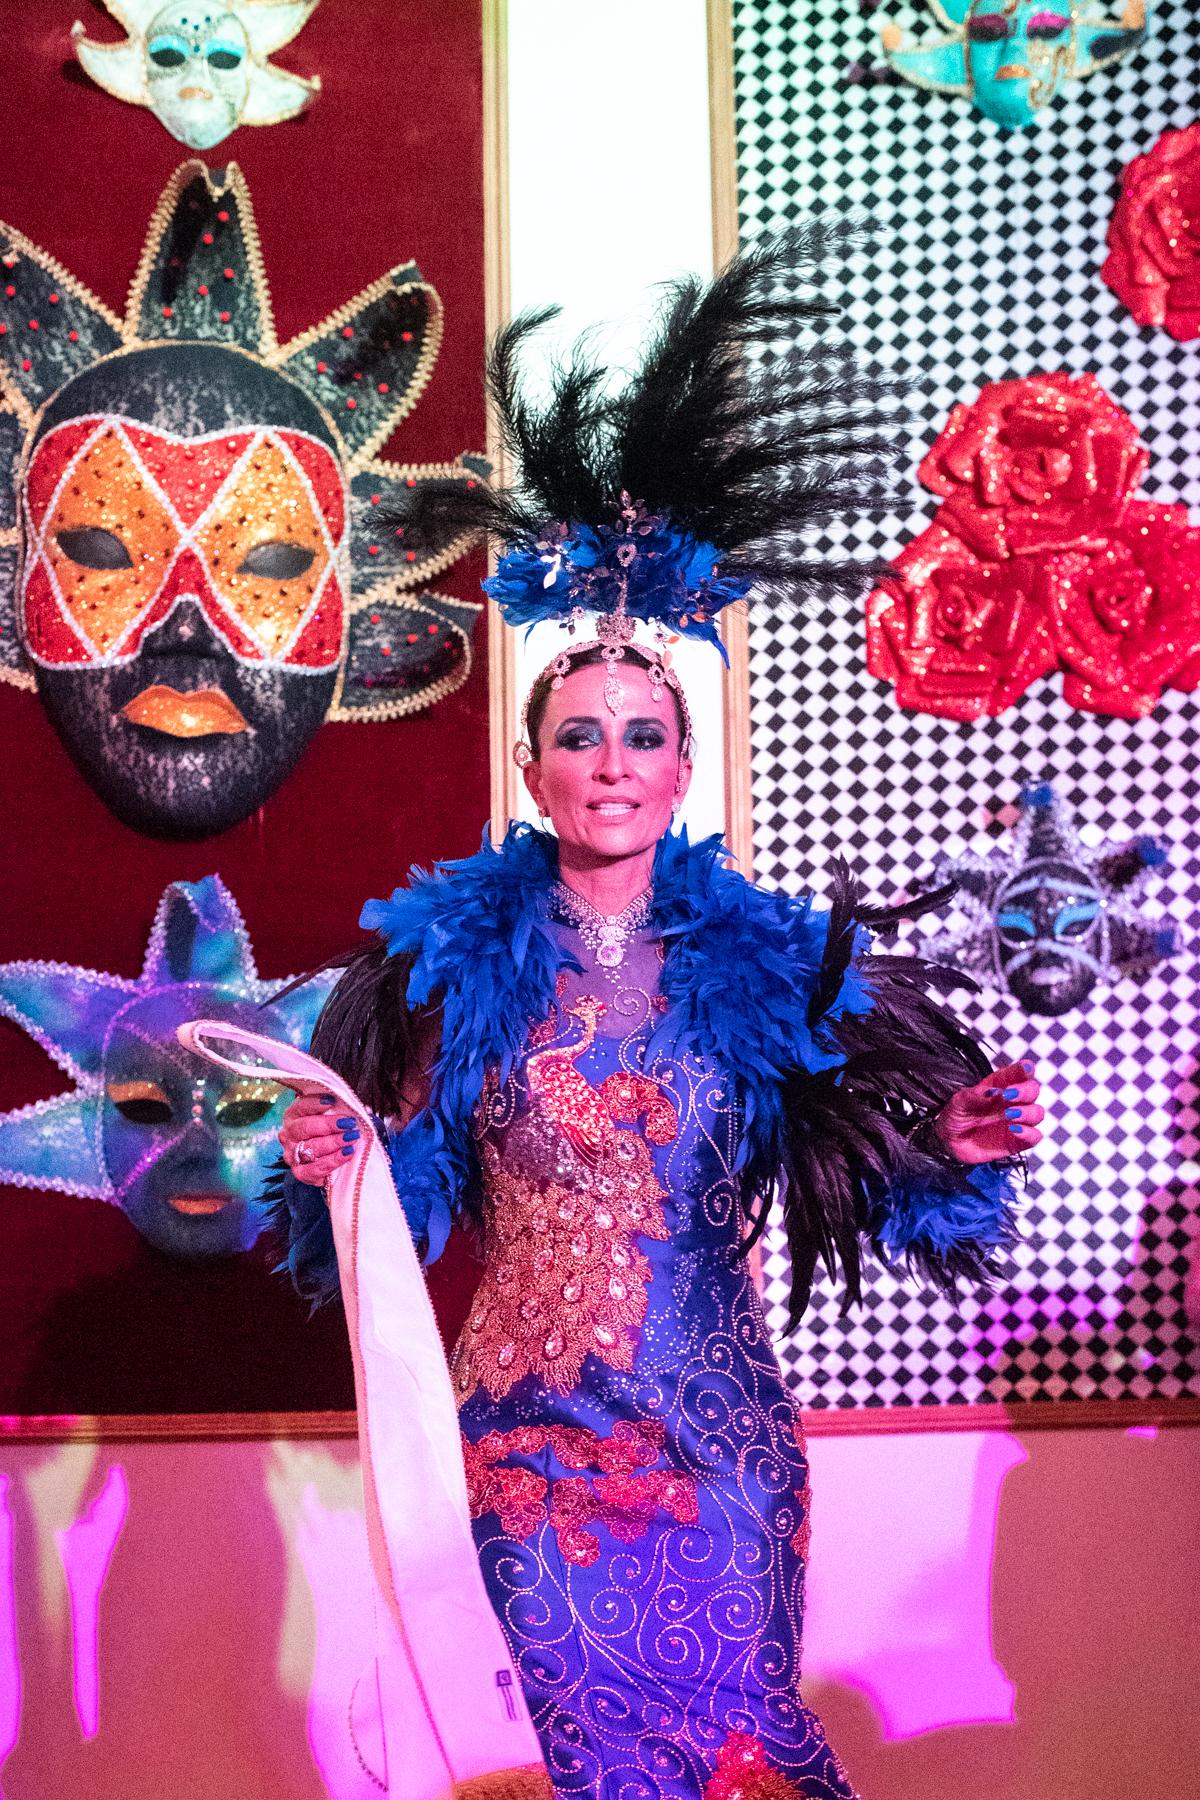 Stacie Flinner x Belmond Copacabana Carnival Ball-39.jpg